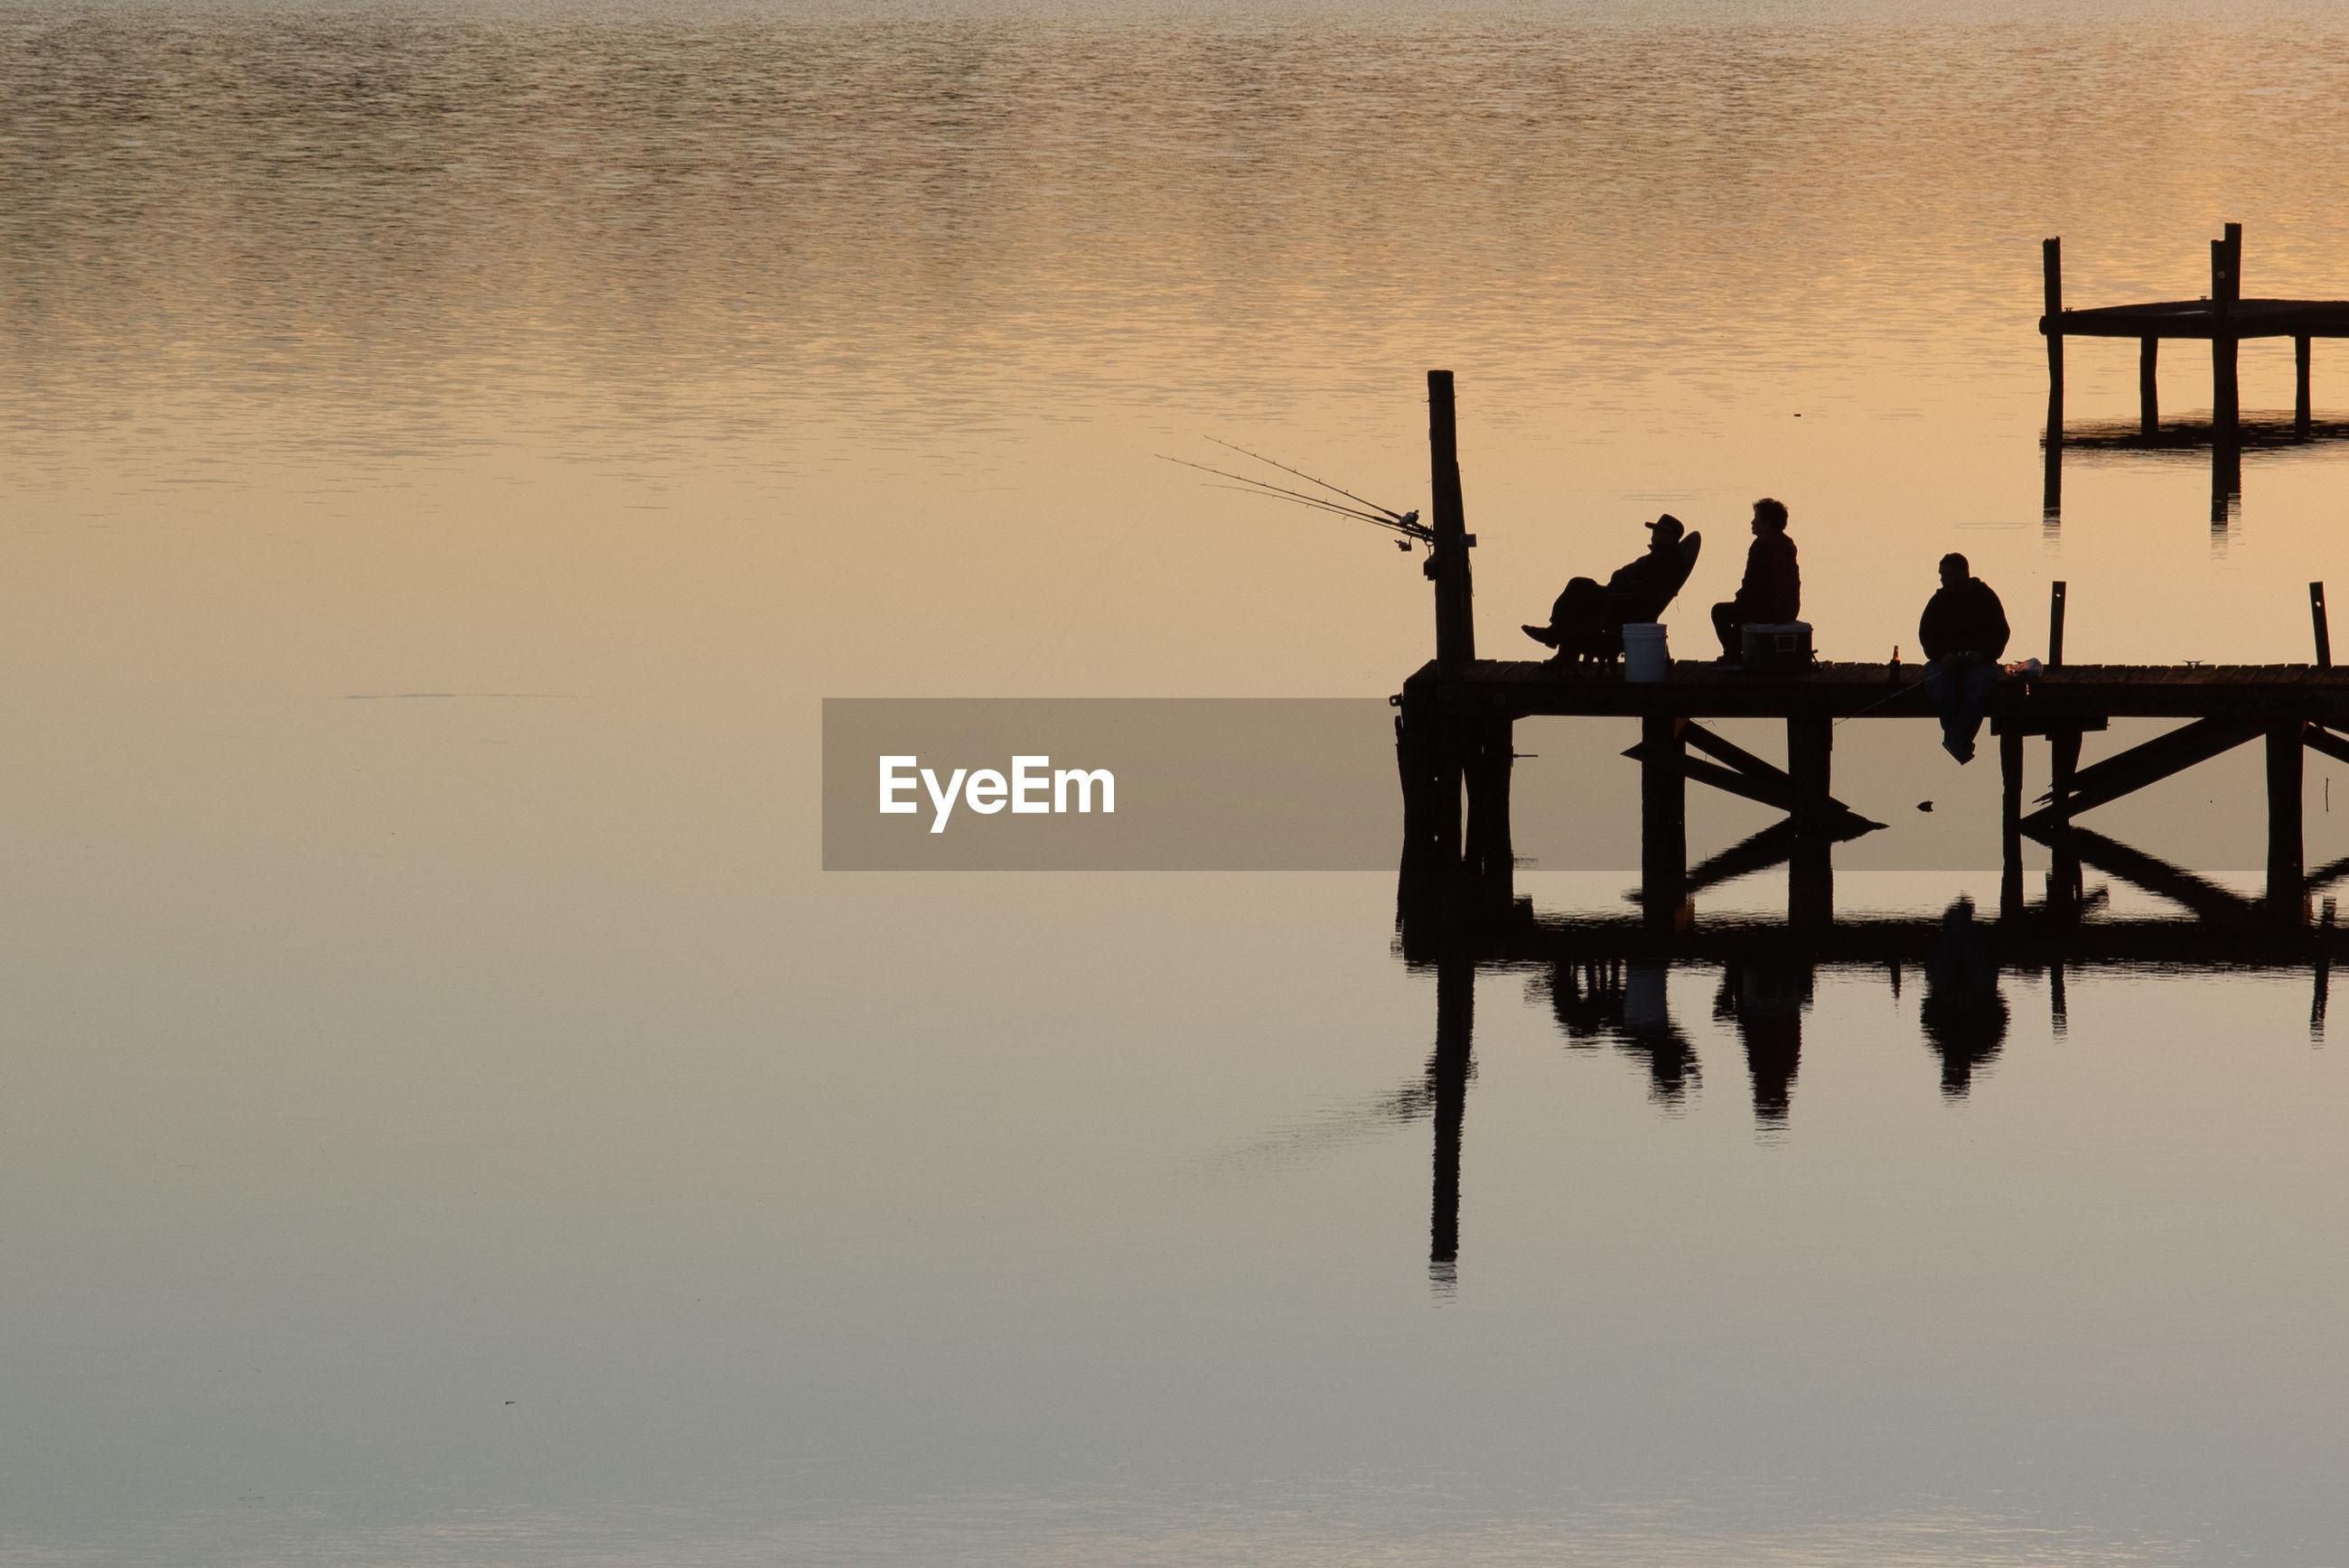 SILHOUETTE MEN STANDING ON LAKE AGAINST SKY DURING SUNSET